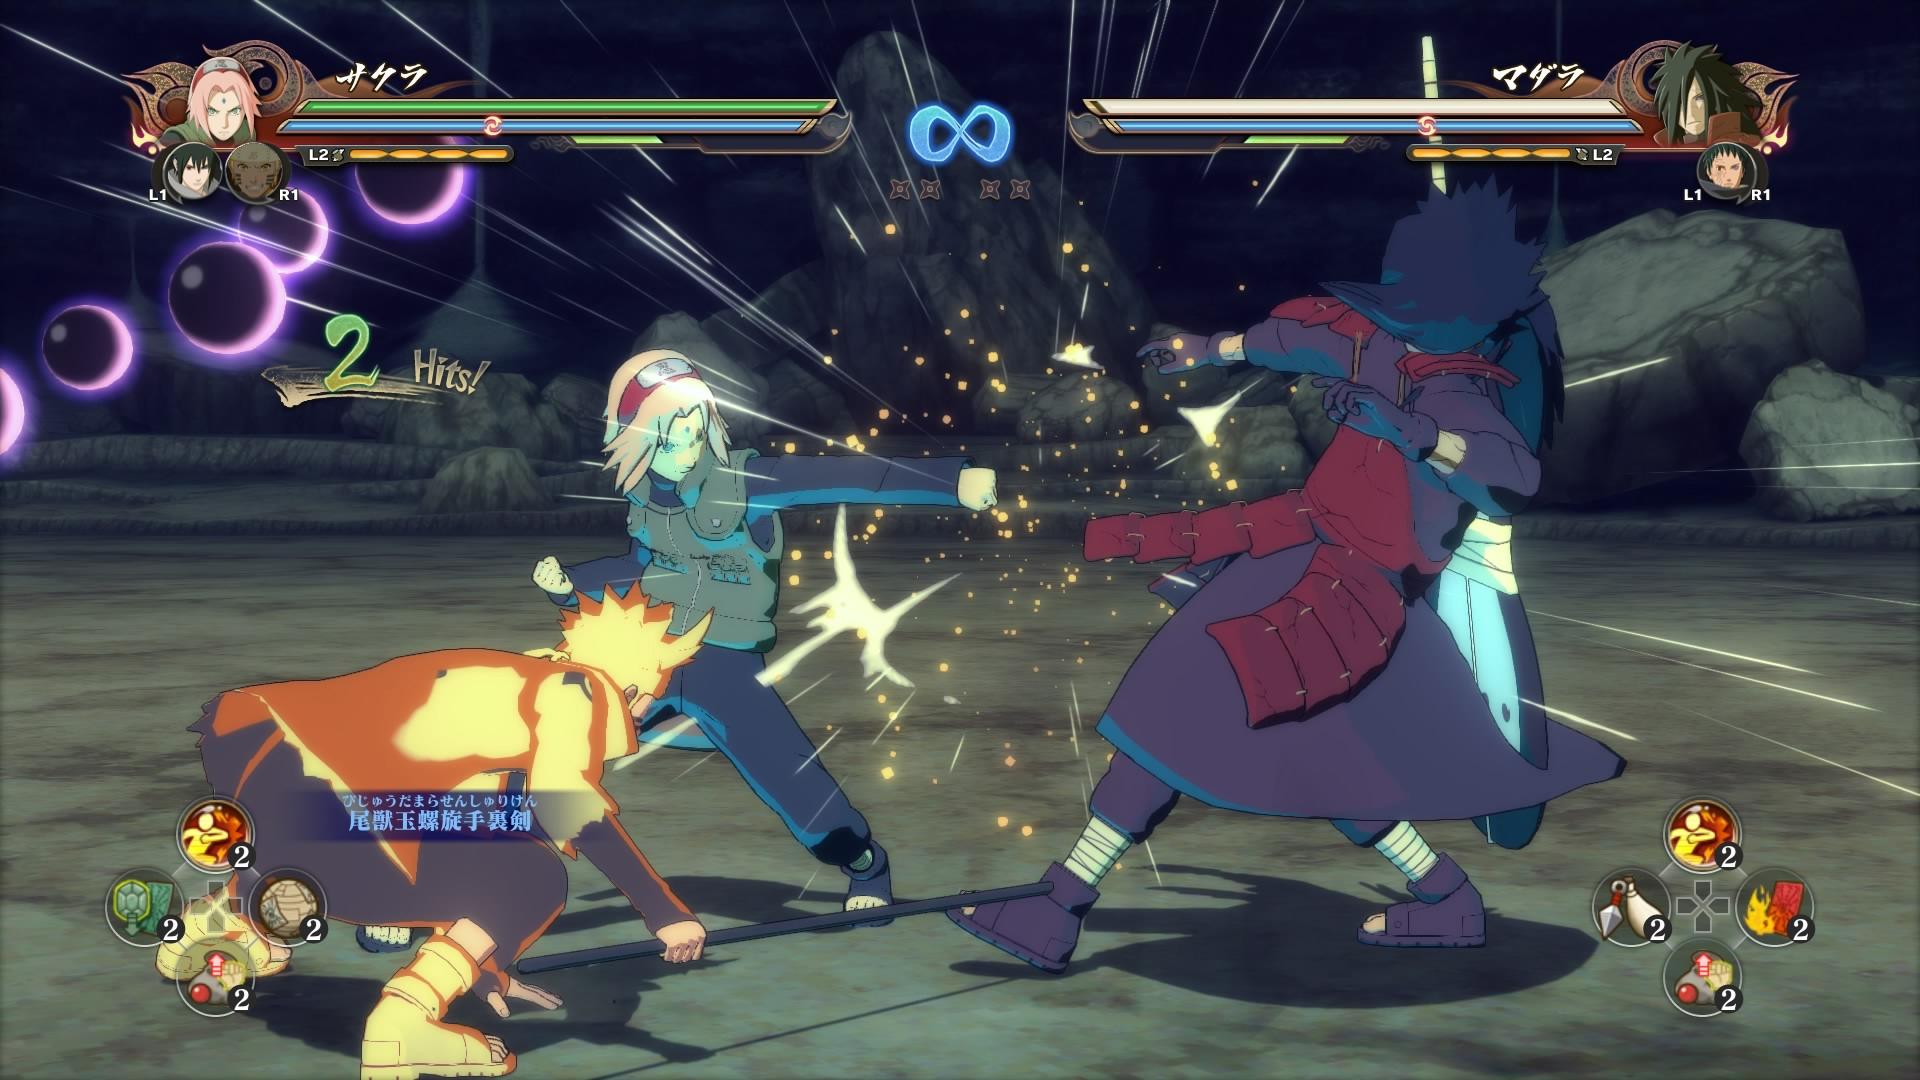 Bandai Namco Announces The Storm Championship